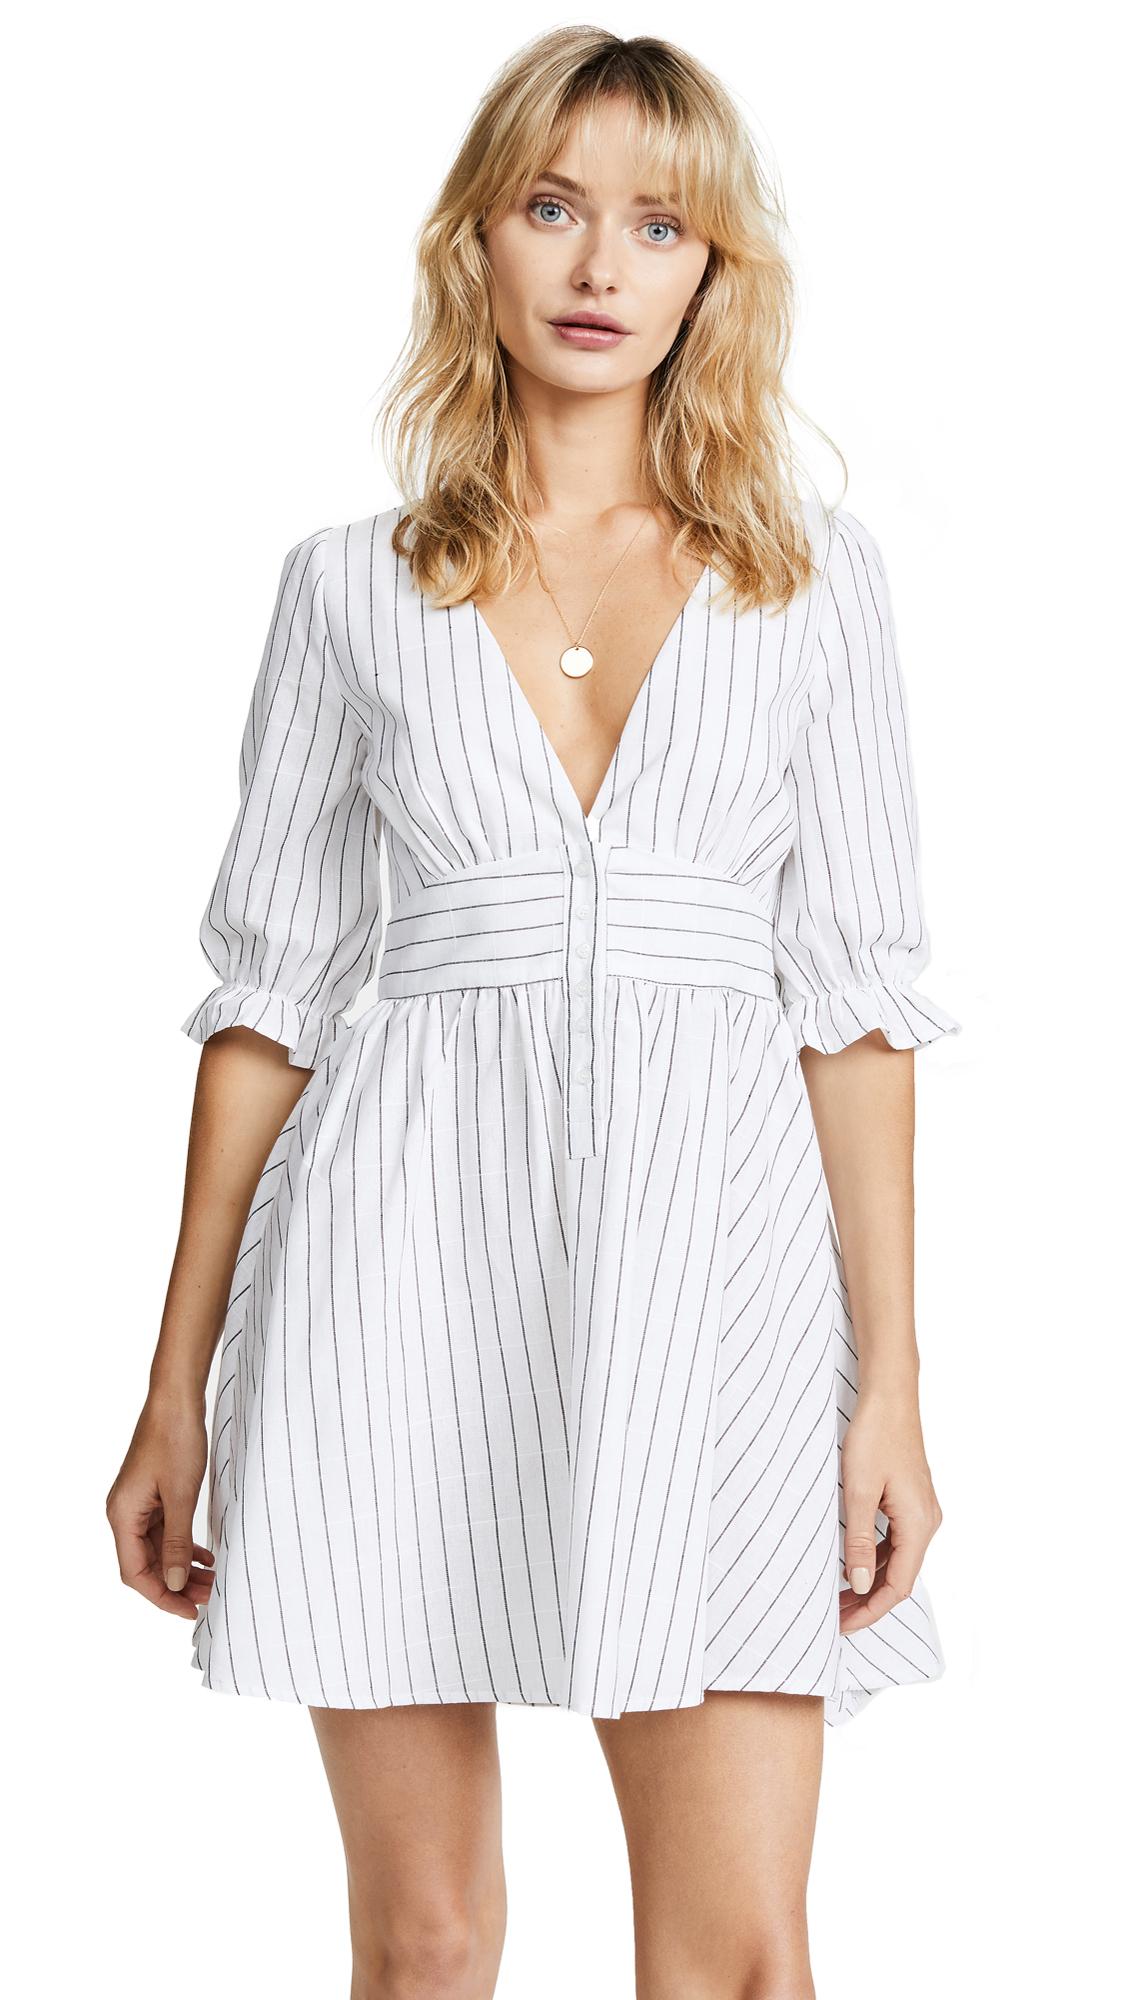 re: named Stripe Dress